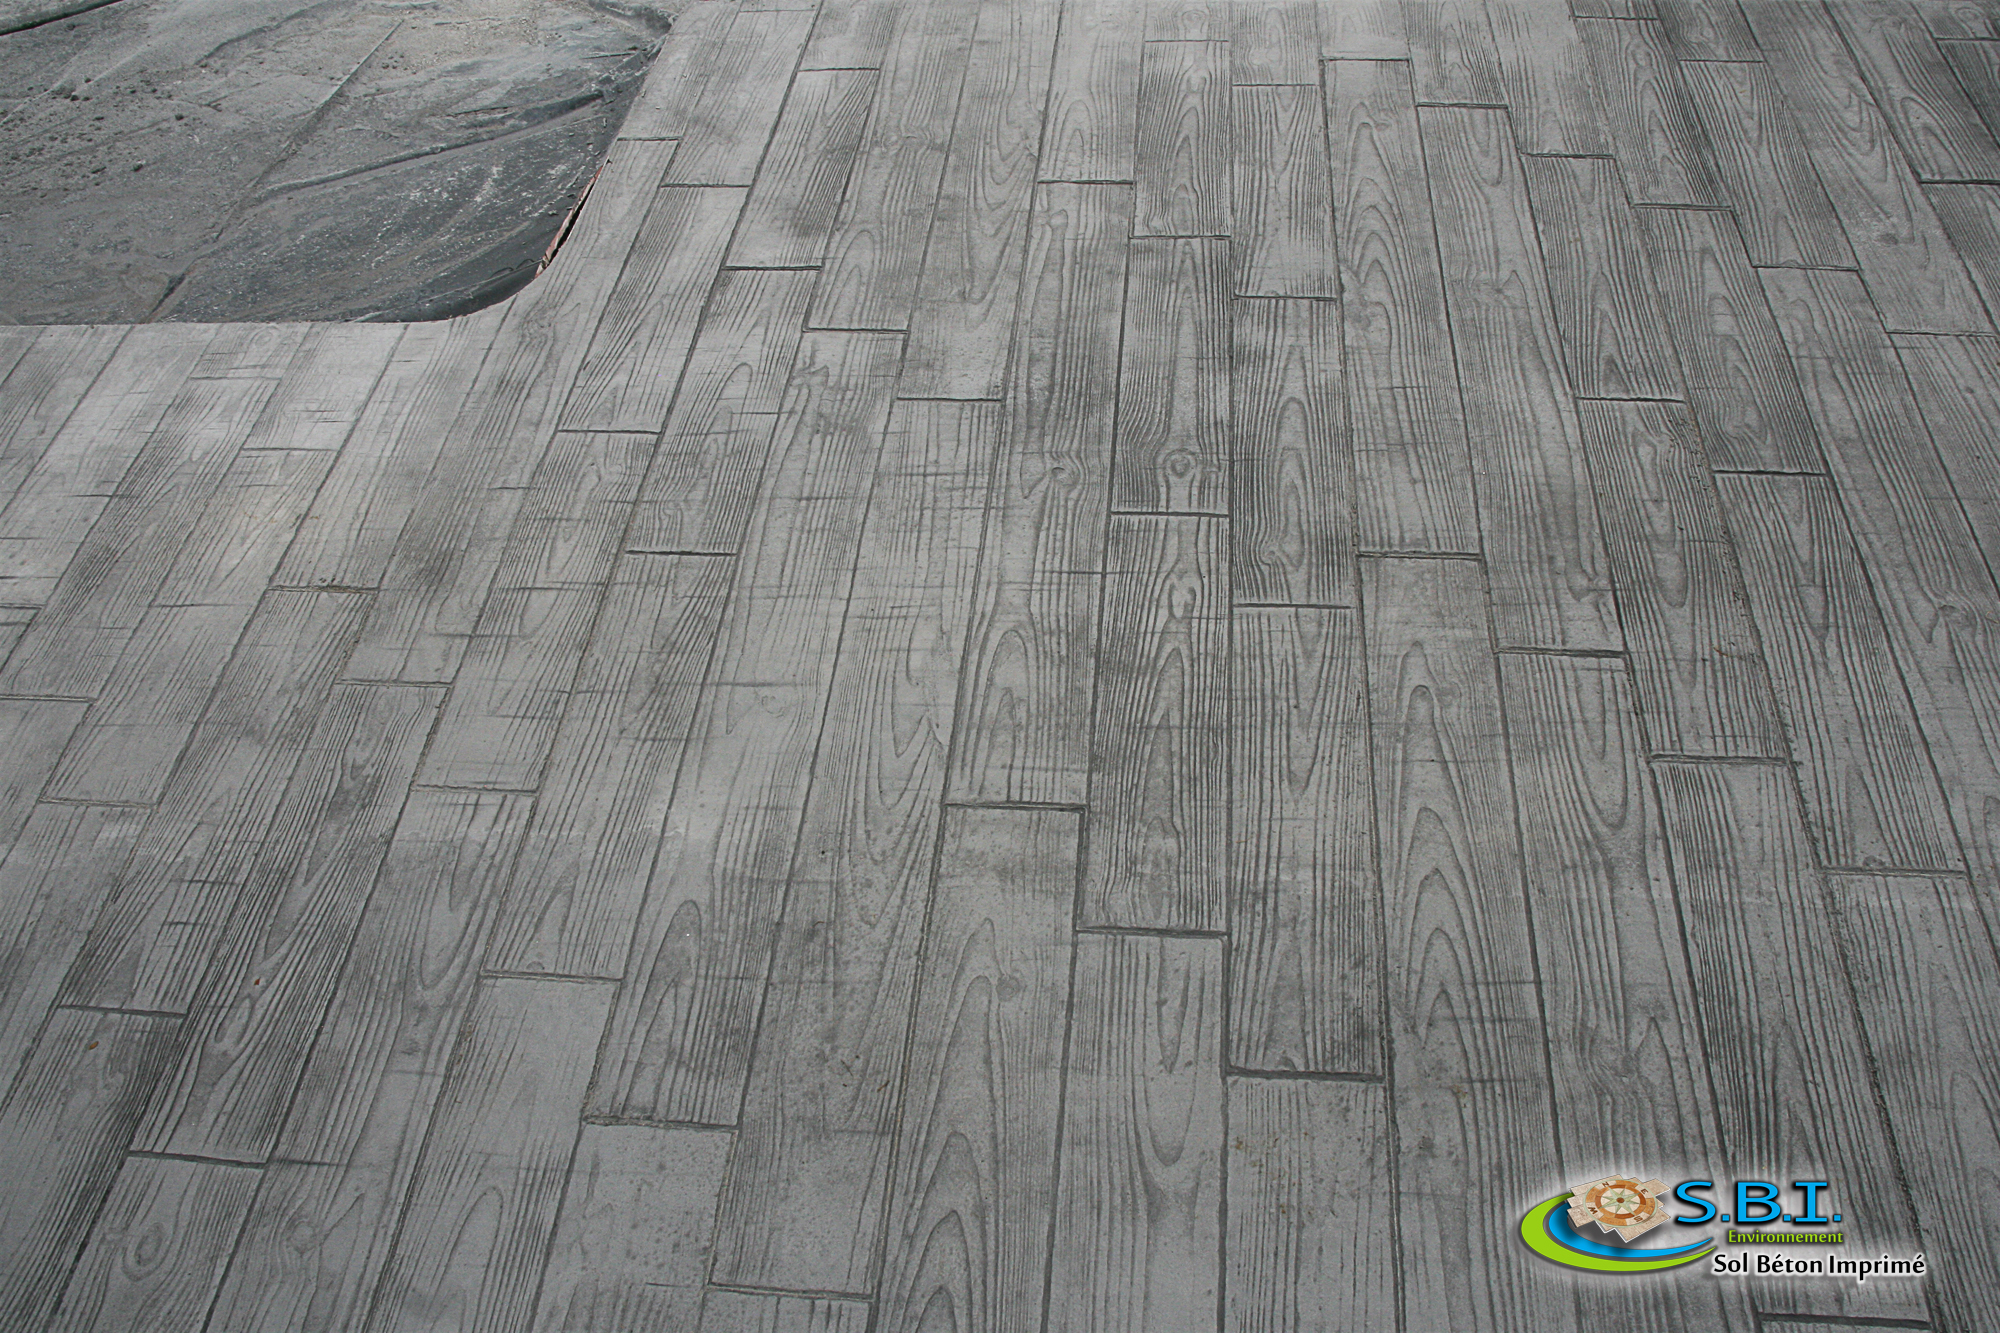 sbi sol b ton imprim nevers le b ton d coratif durable terrasse b ton imprim. Black Bedroom Furniture Sets. Home Design Ideas